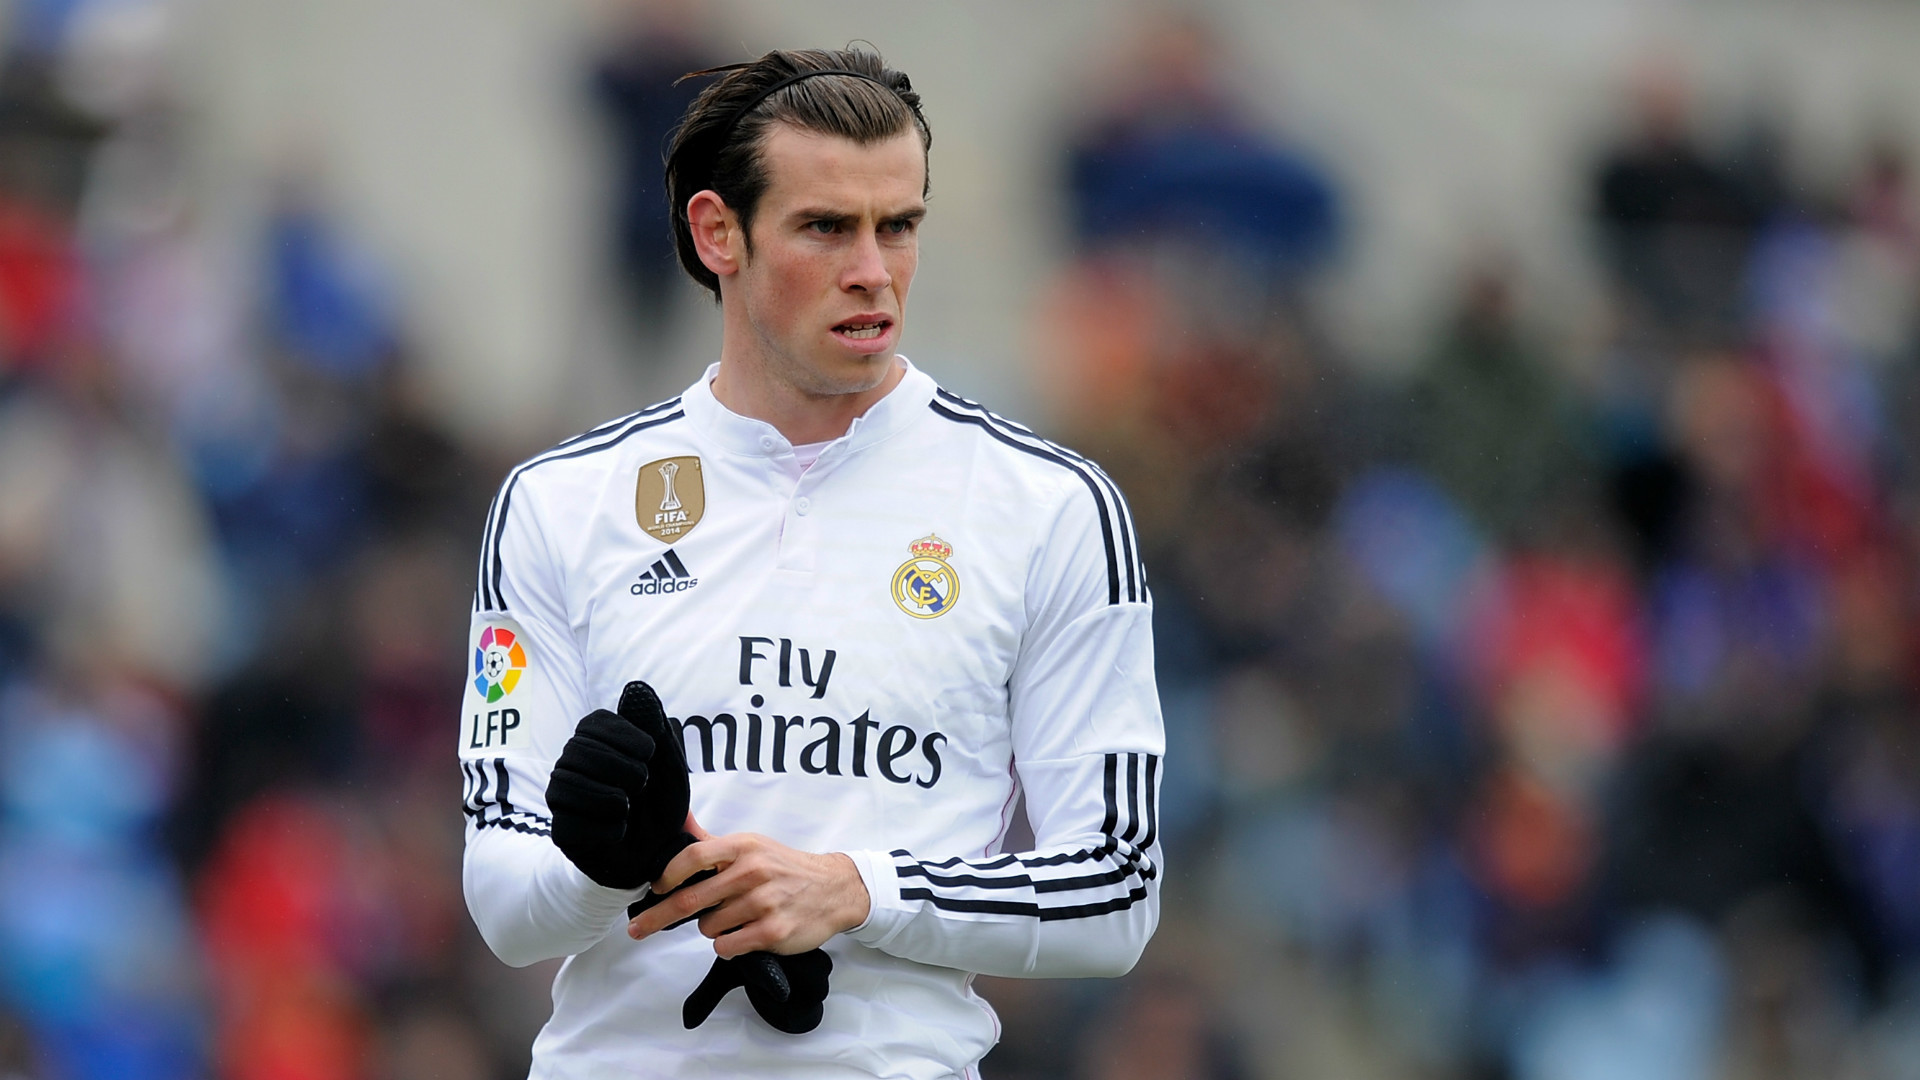 Real Madrid Iphone 4 Wallpaper Gareth Bale Wallpaper 2018 Hd 79 Images